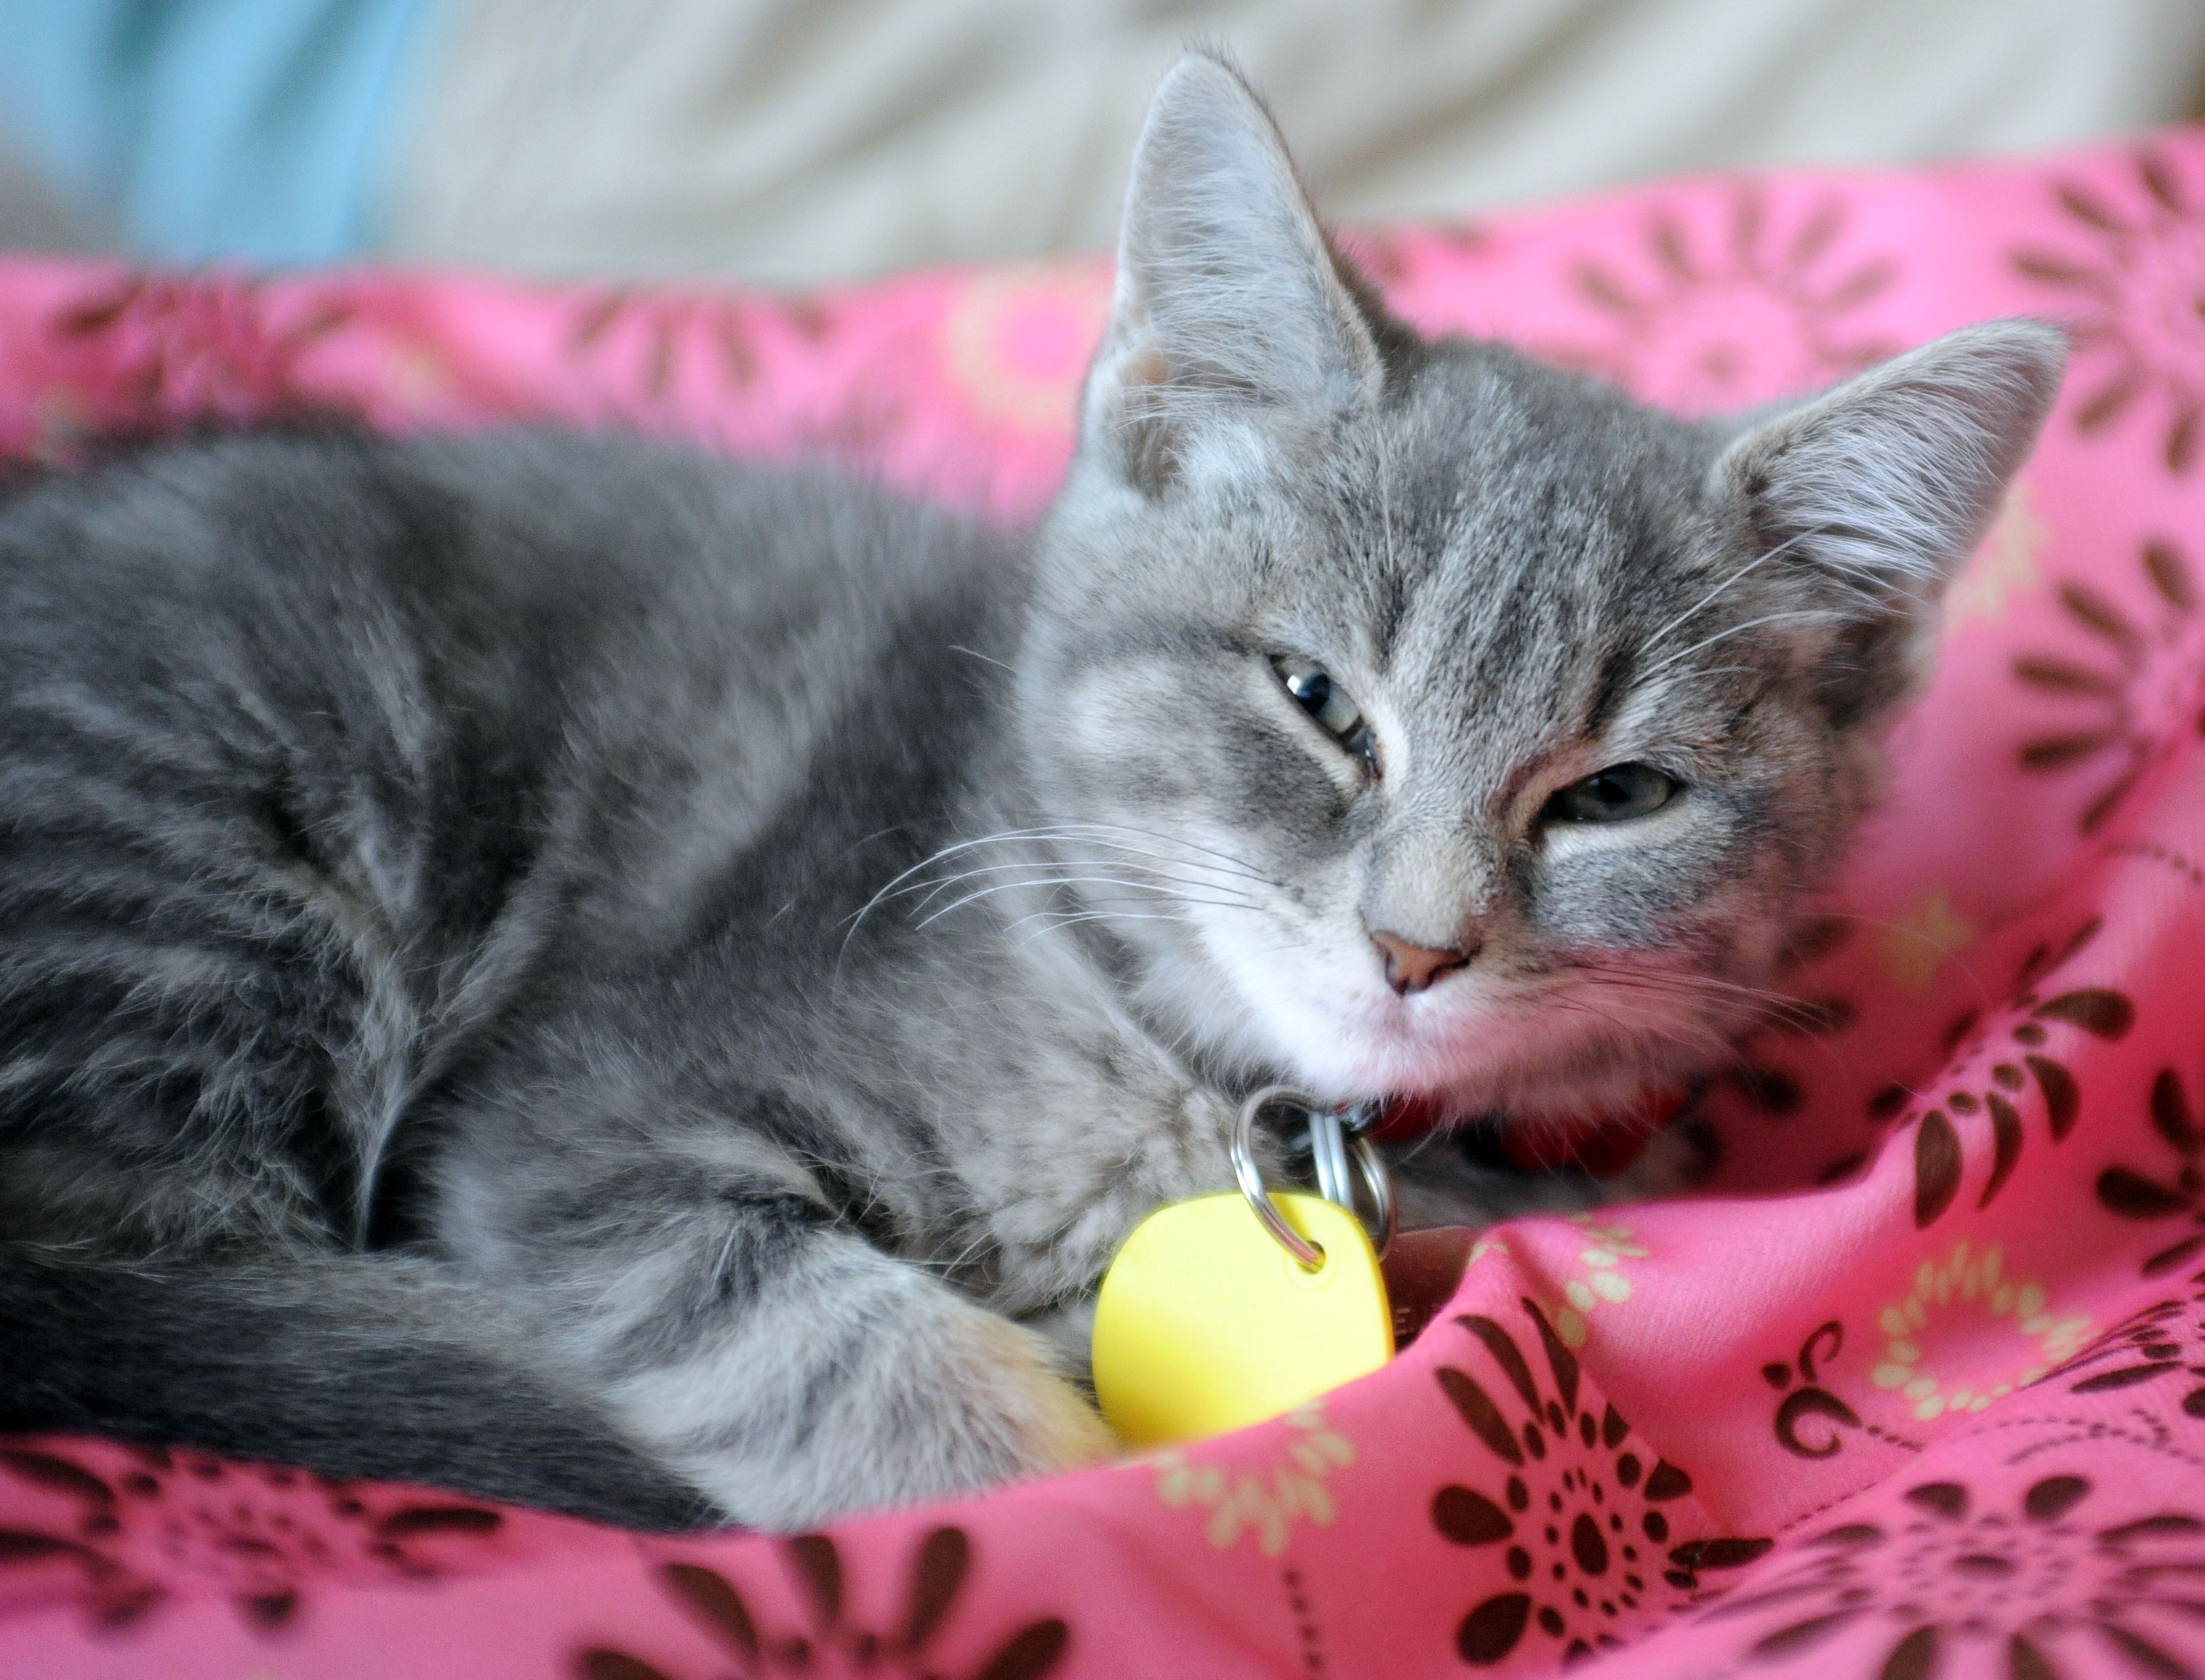 Humane Society discounts cat adoptions through July